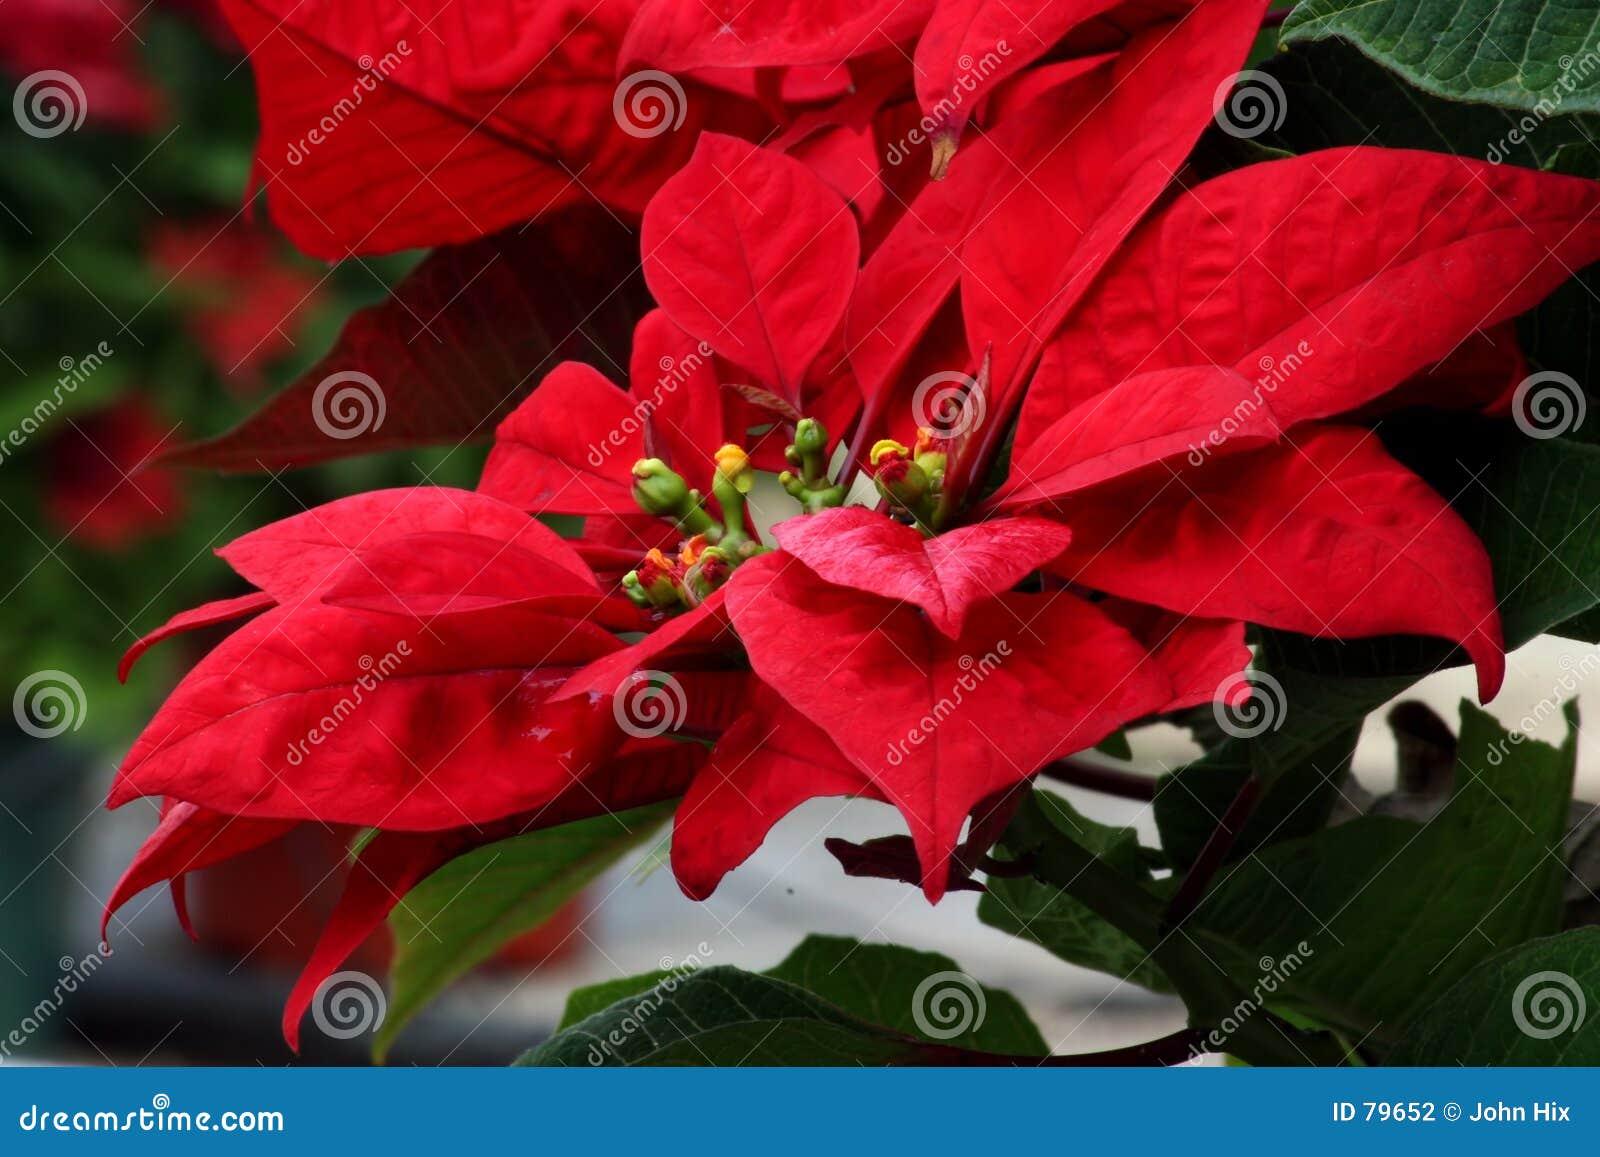 Rare Poinsettia Stock Photography - Image: 79652